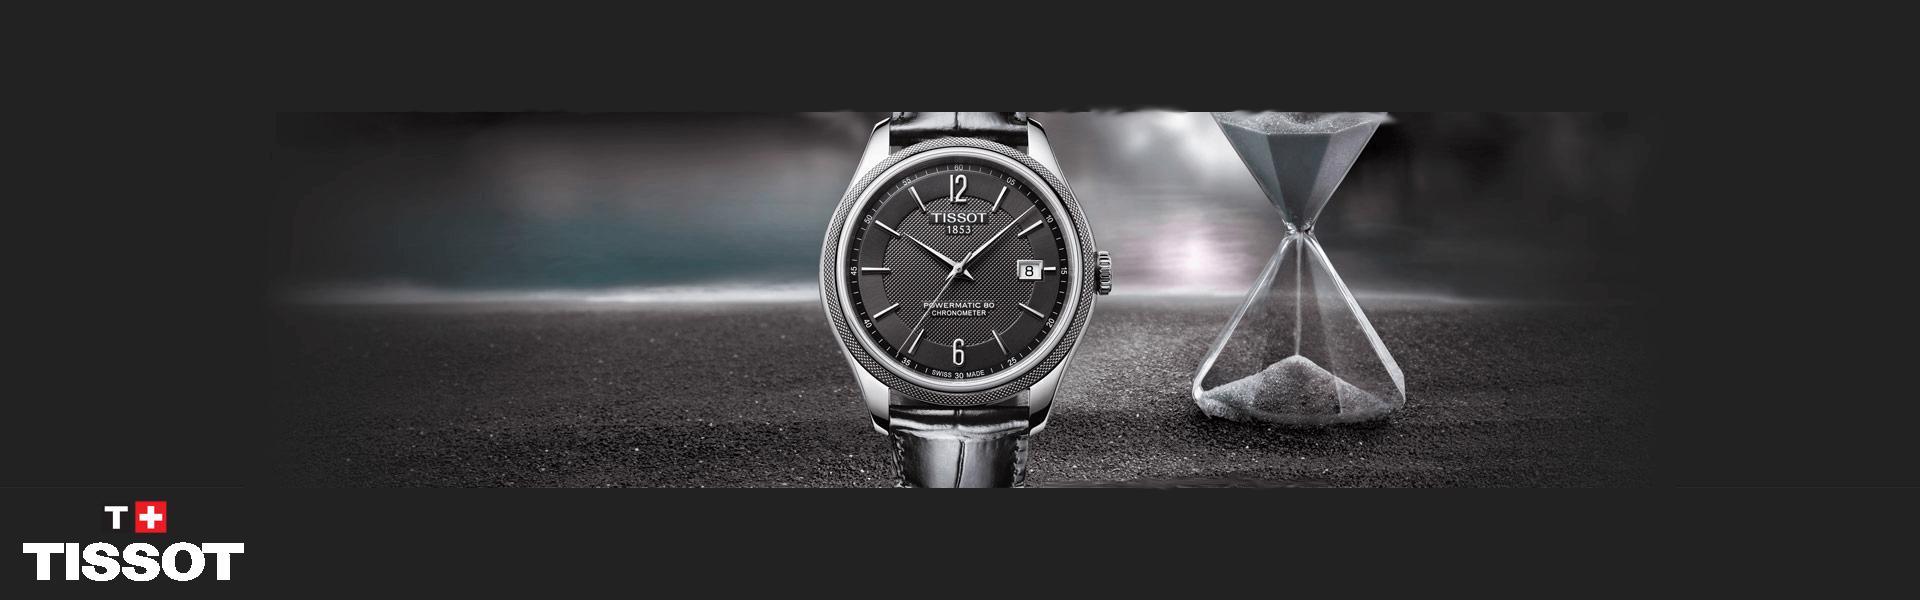 Slide Tissot horloges